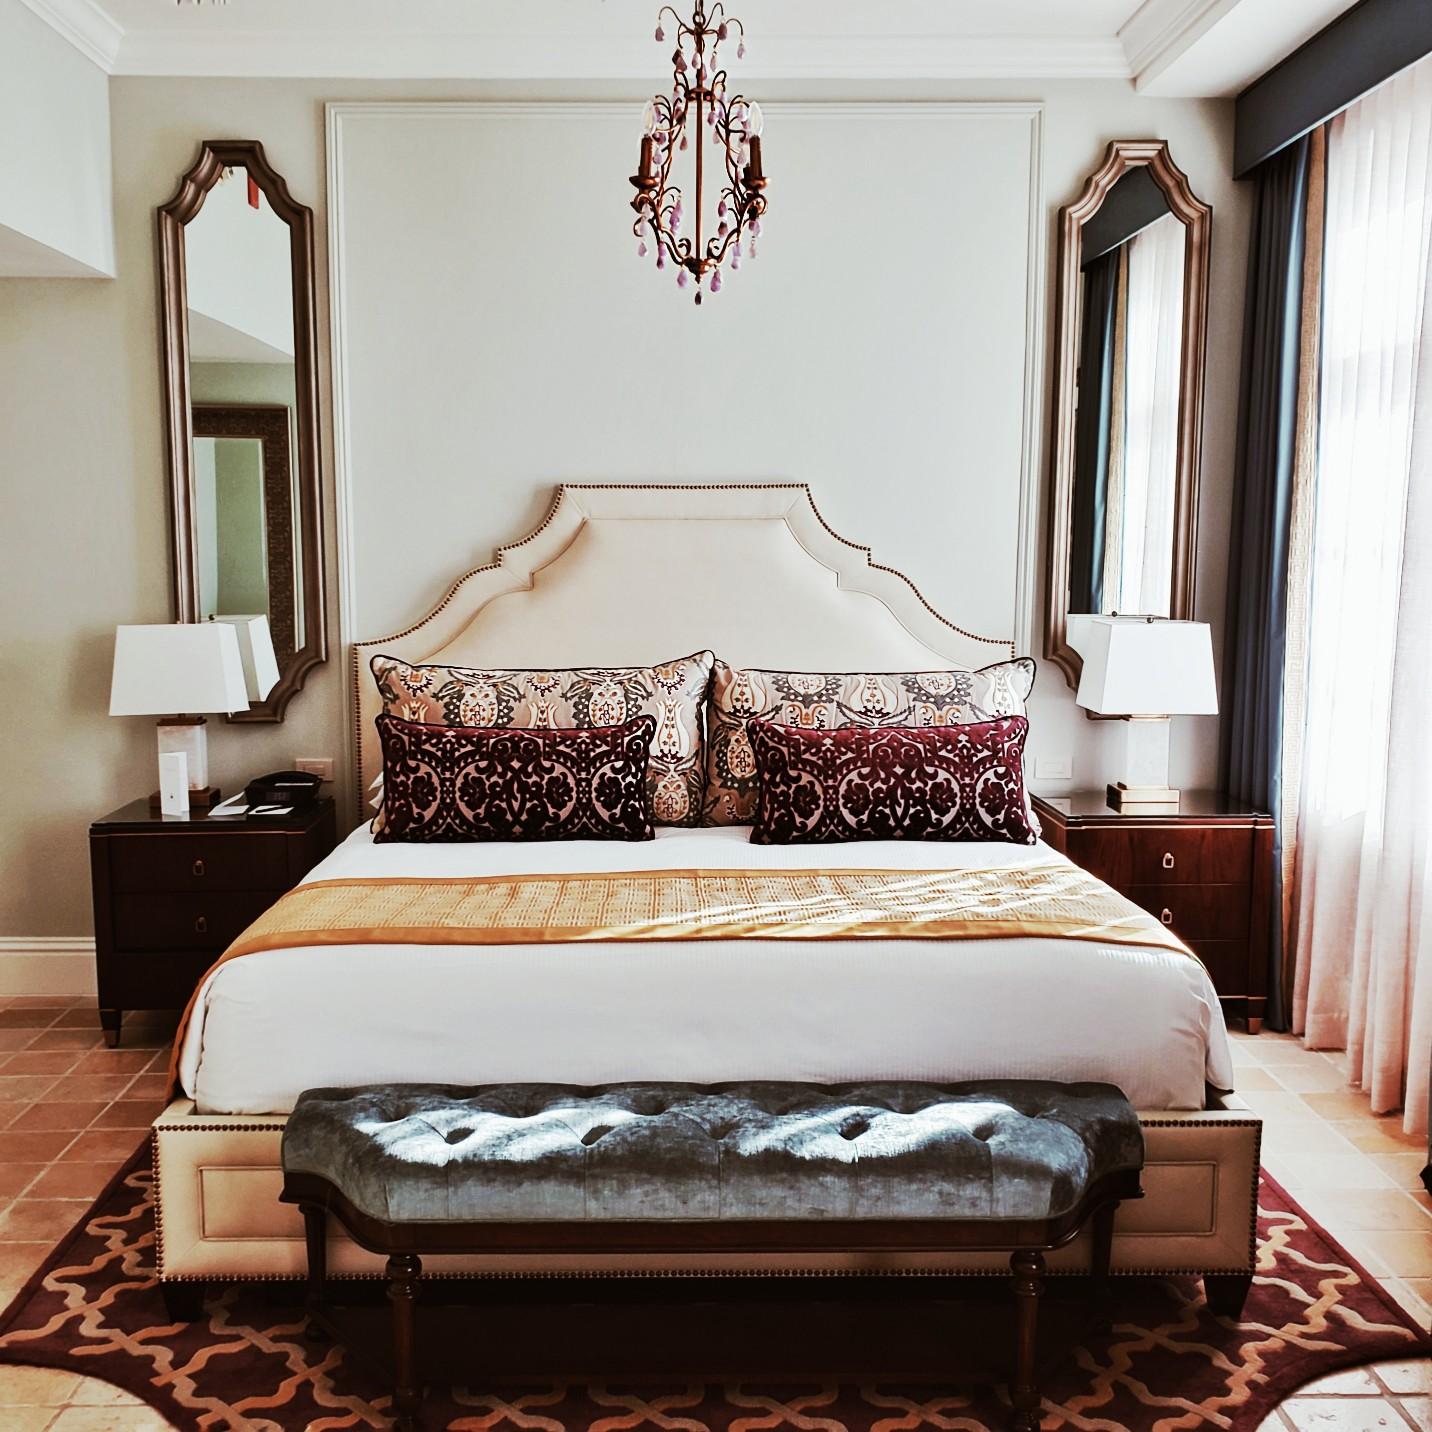 Biltmore Hotel Miami Coral Gables Luxury Hotel Room Travel Blogger